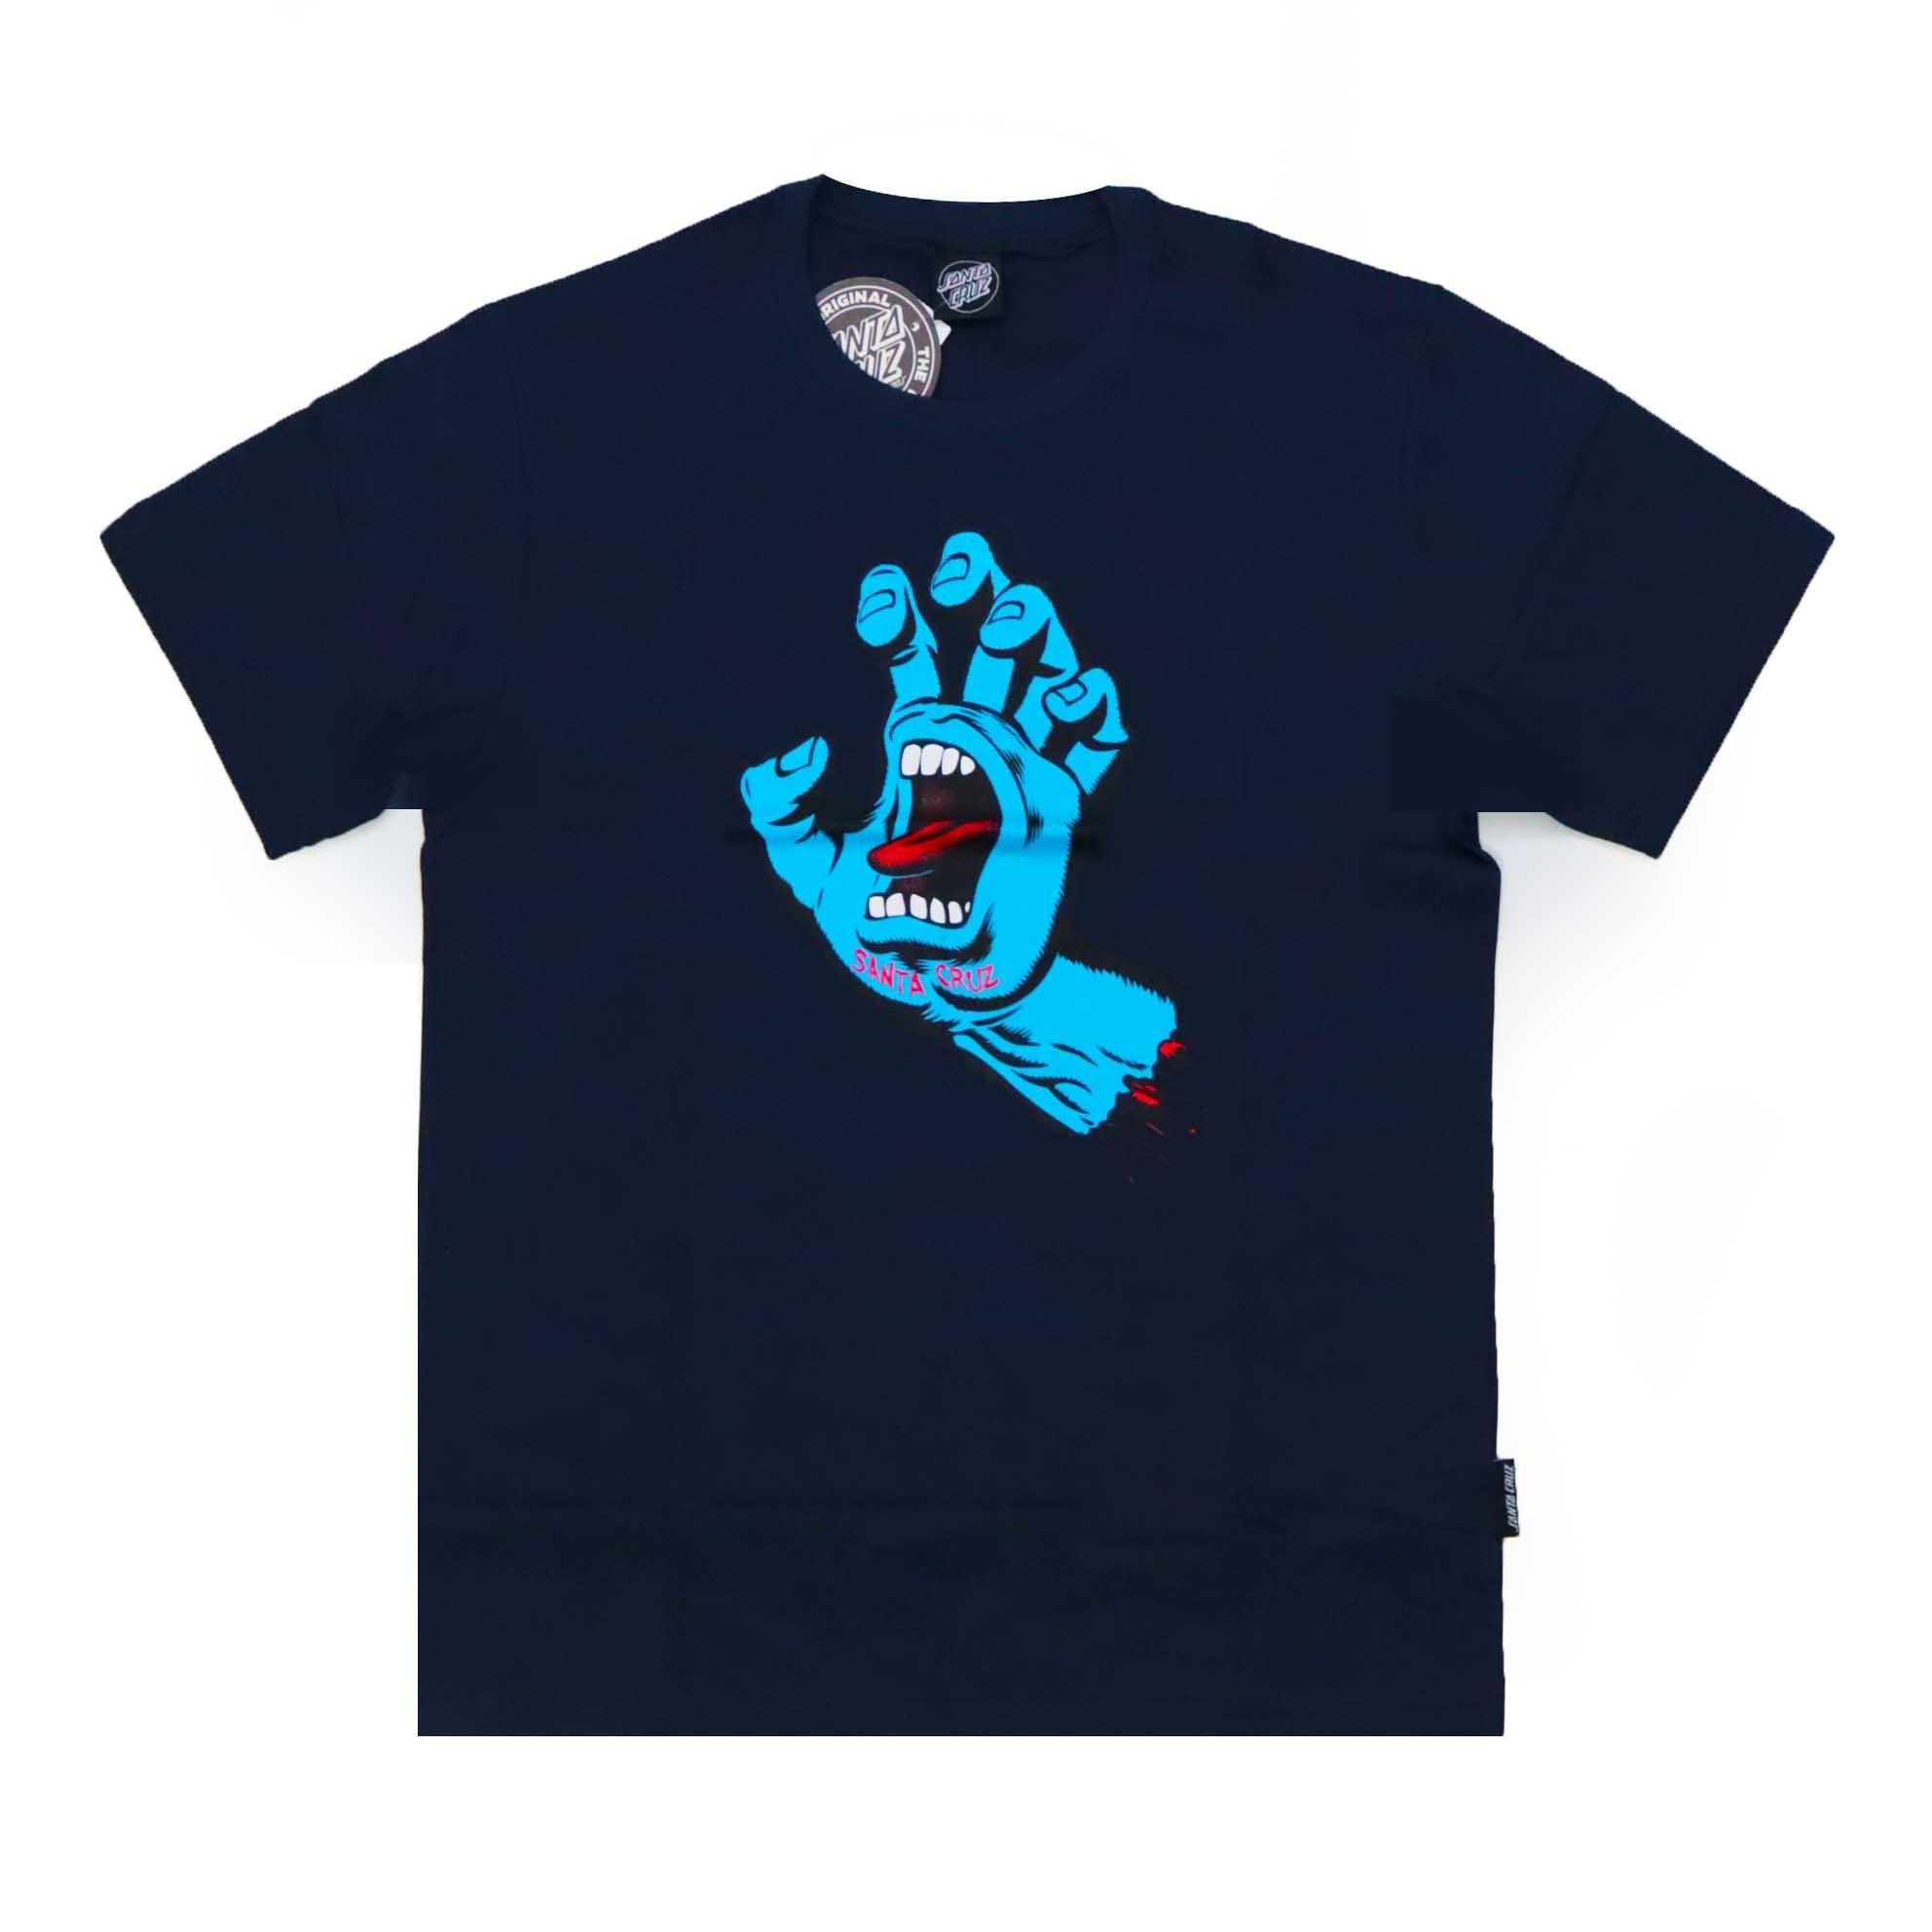 Camiseta Santa Cruz  Screaming Hand - Azul Marinho/Azul